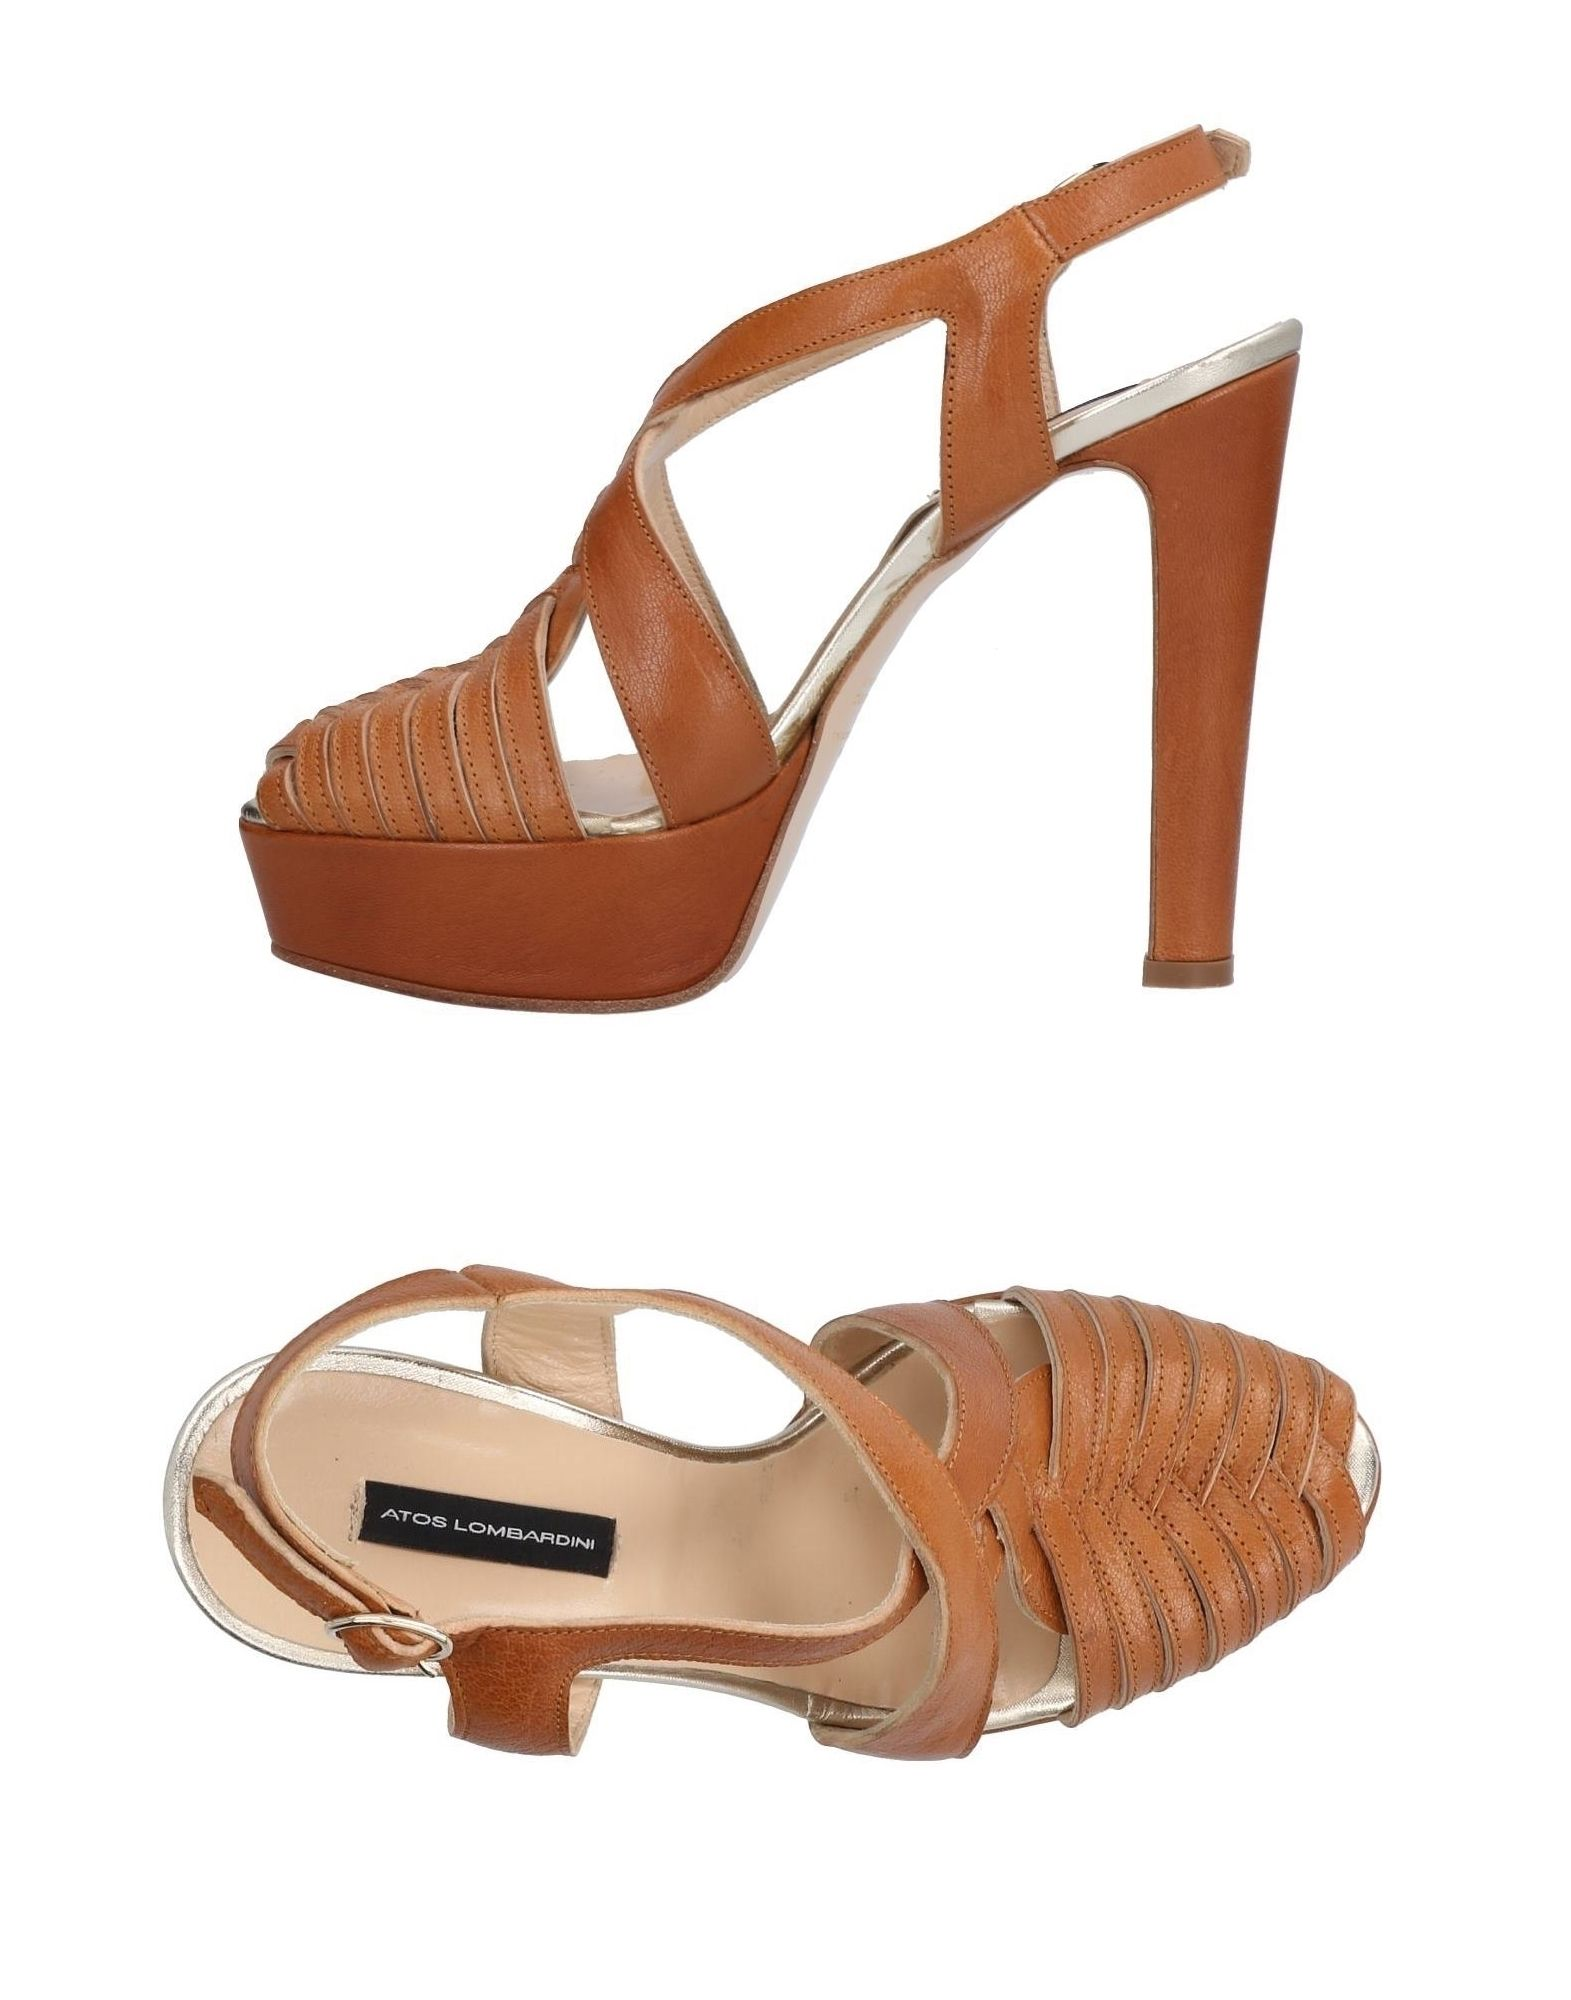 Atos Lombardini Sandals - Women Atos  Lombardini Sandals online on  Atos Canada - 11491759BU 70d758